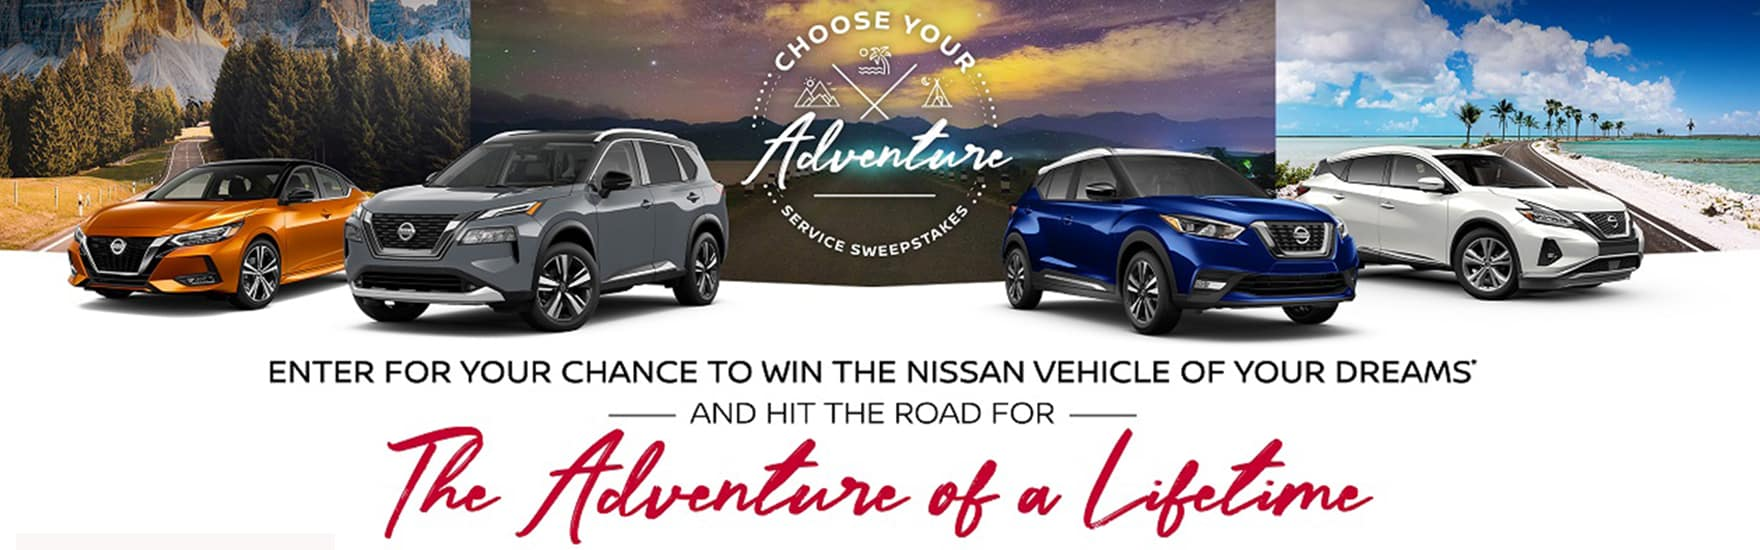 Nissan-of-lumberton-choose-your-adventure-promotion copy